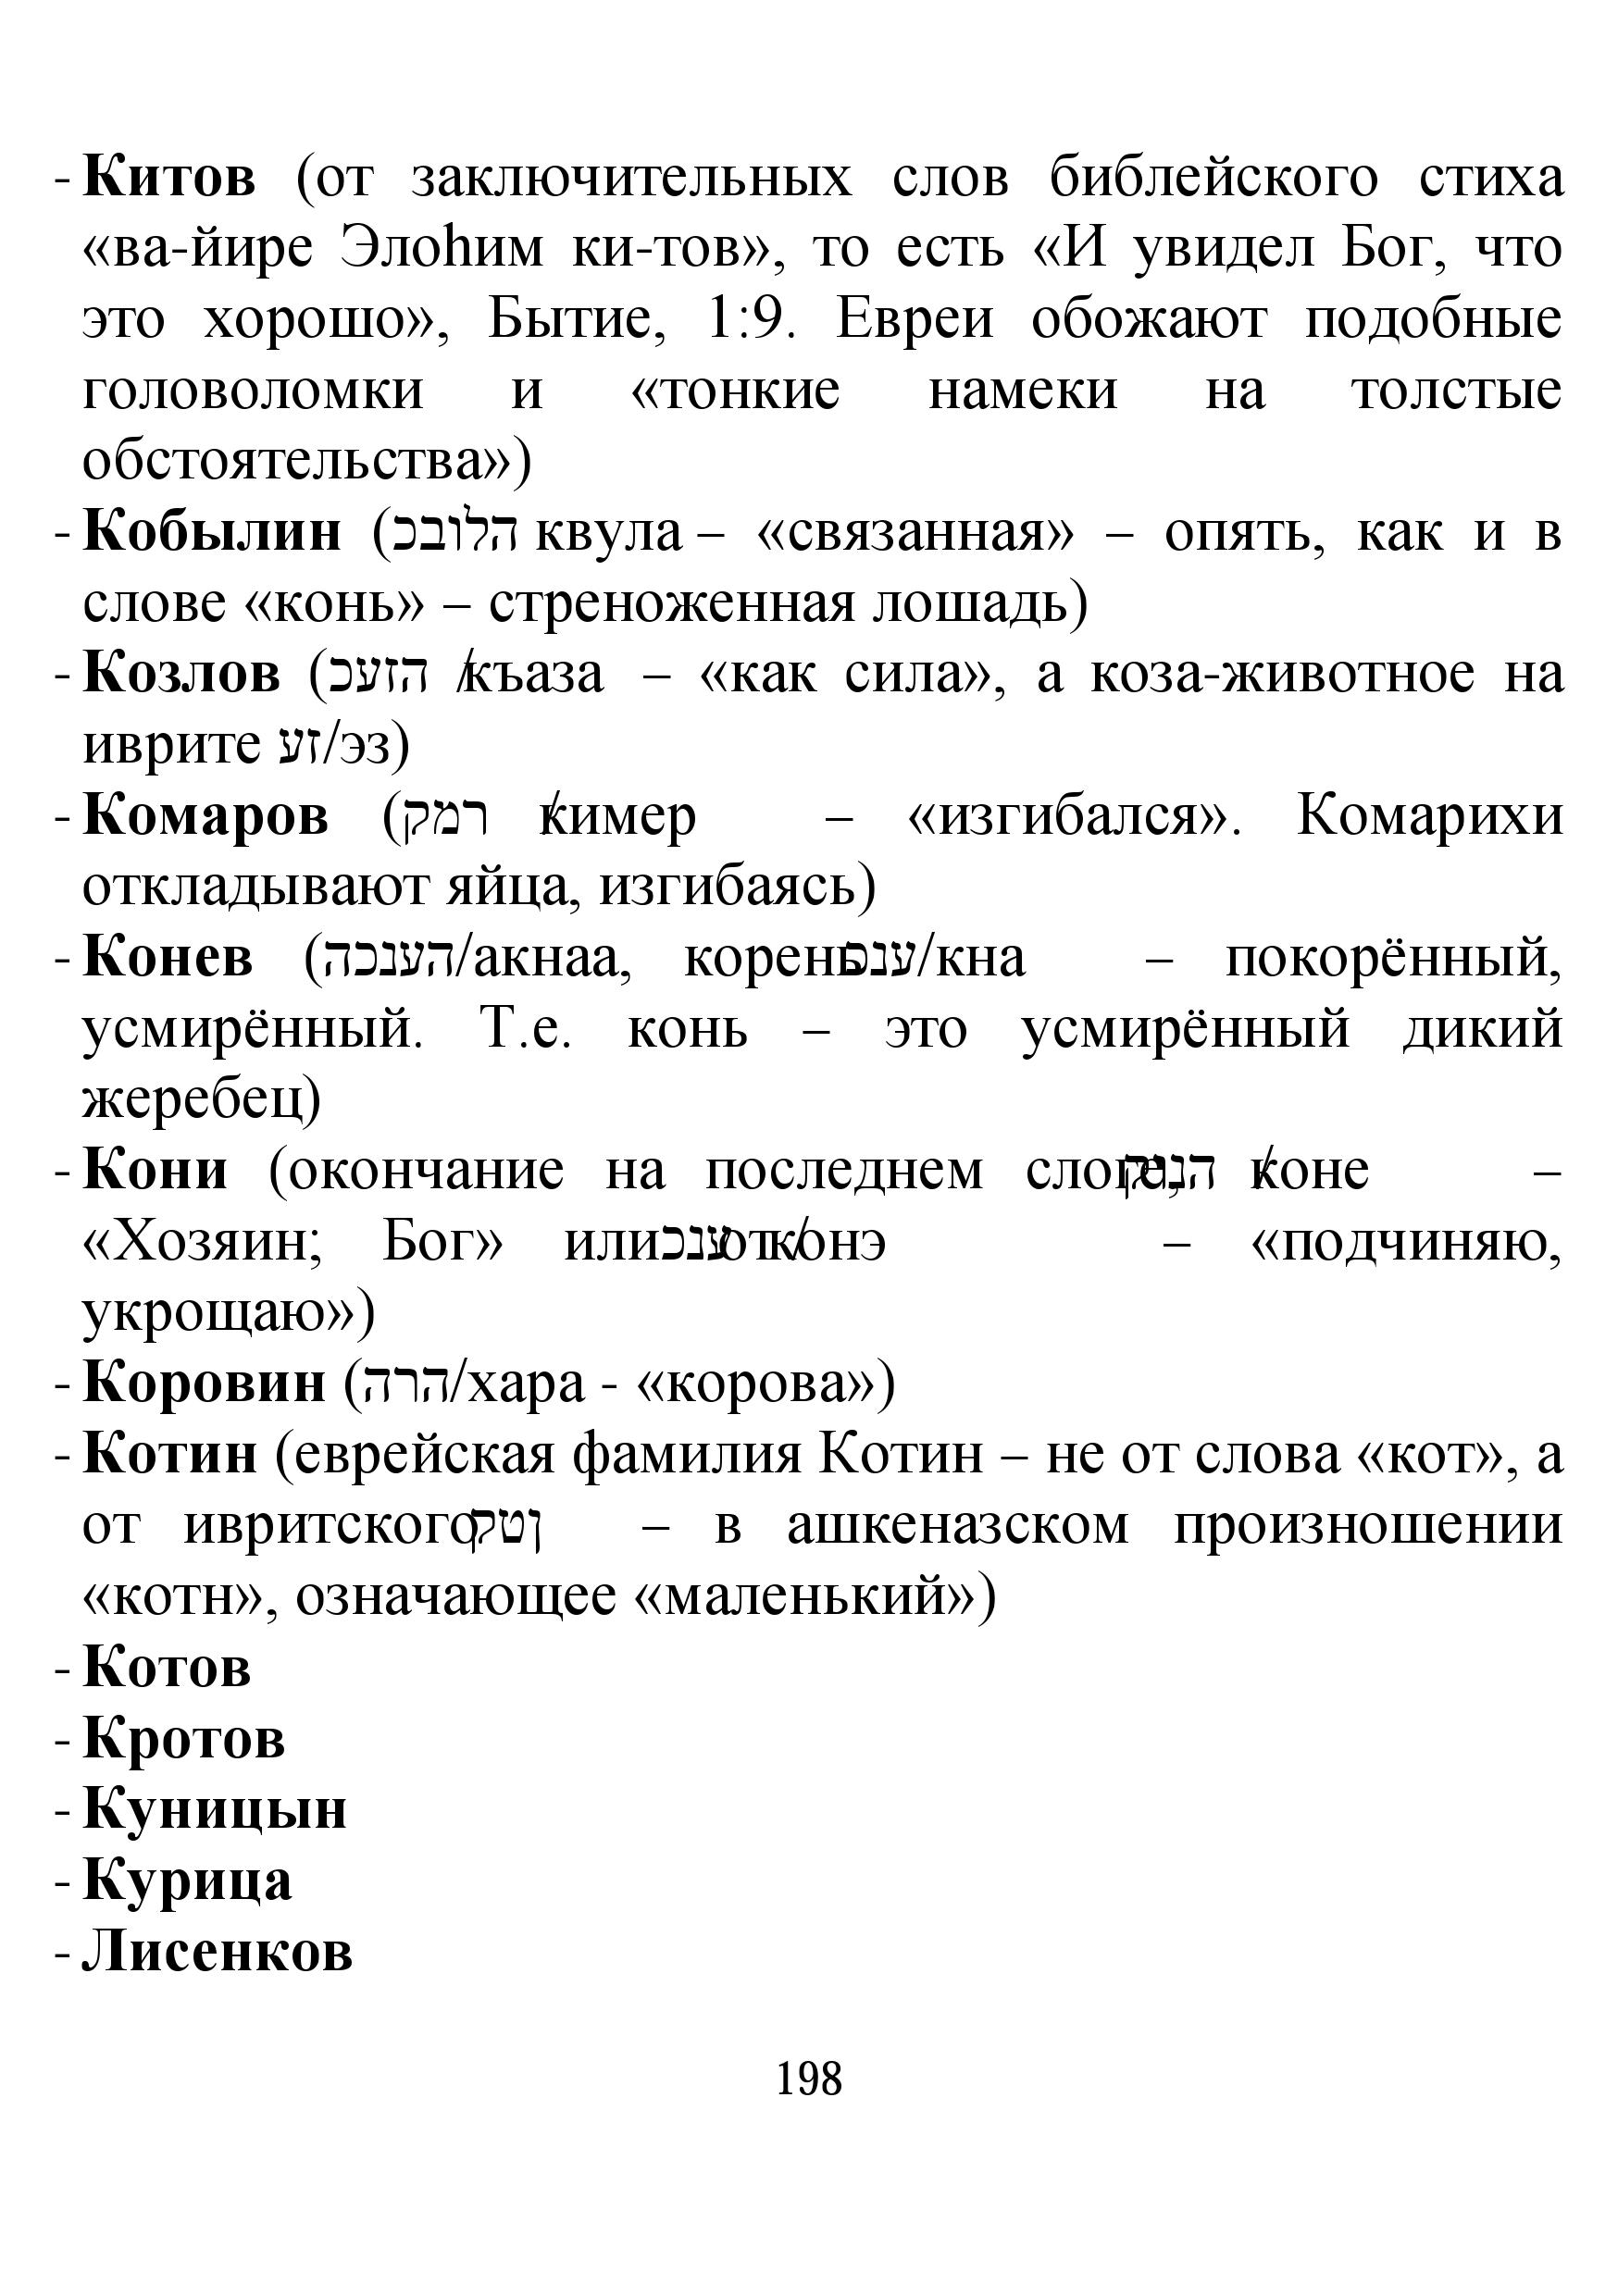 http://s1.uploads.ru/TPKaE.jpg